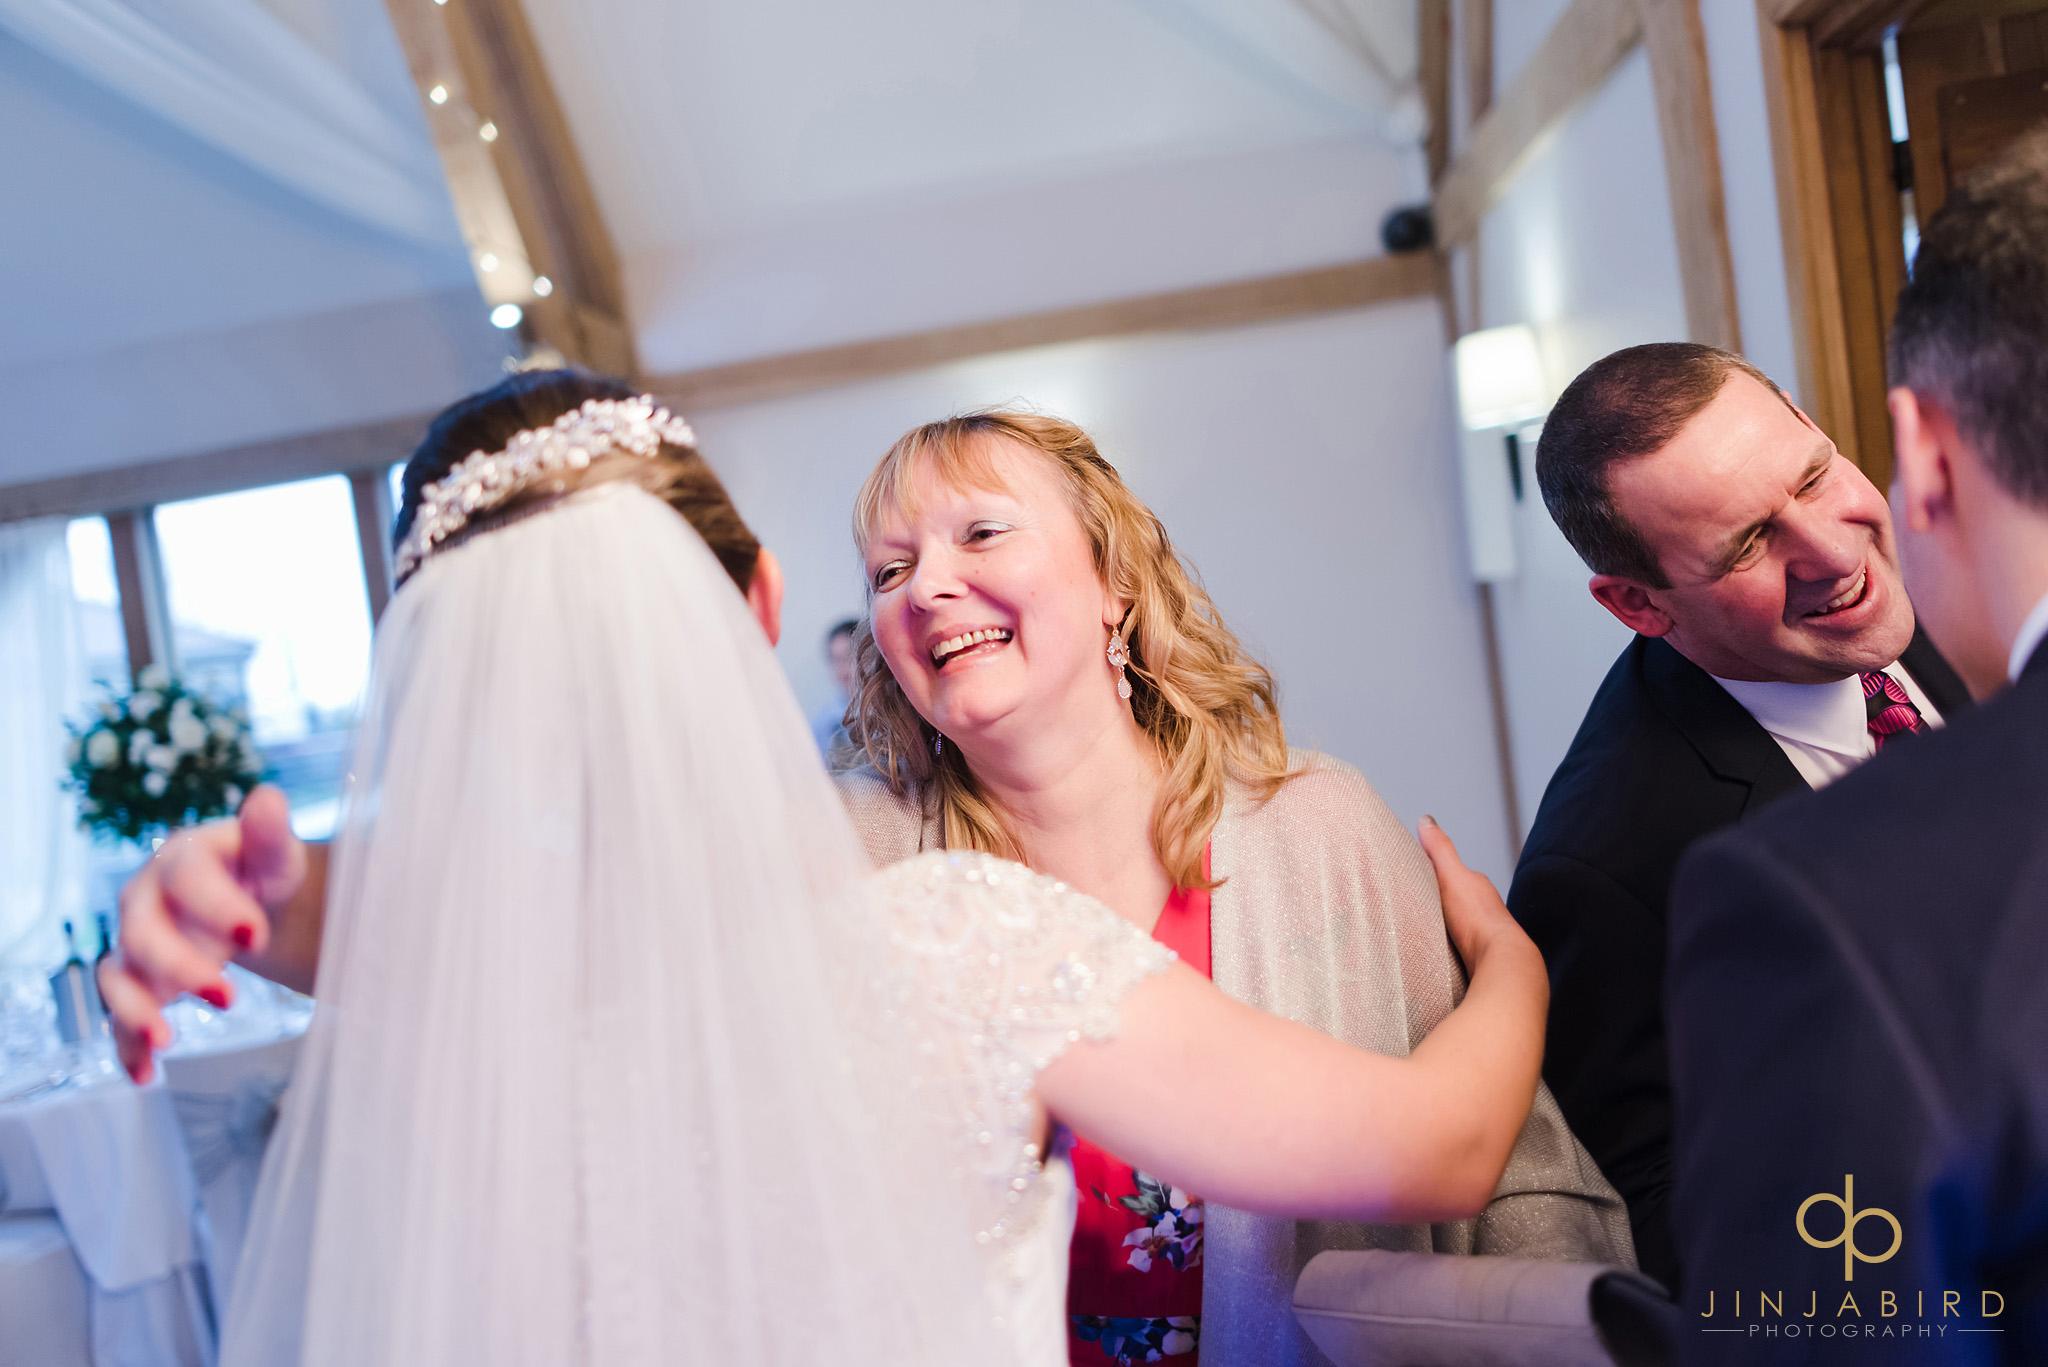 guests greeting bride